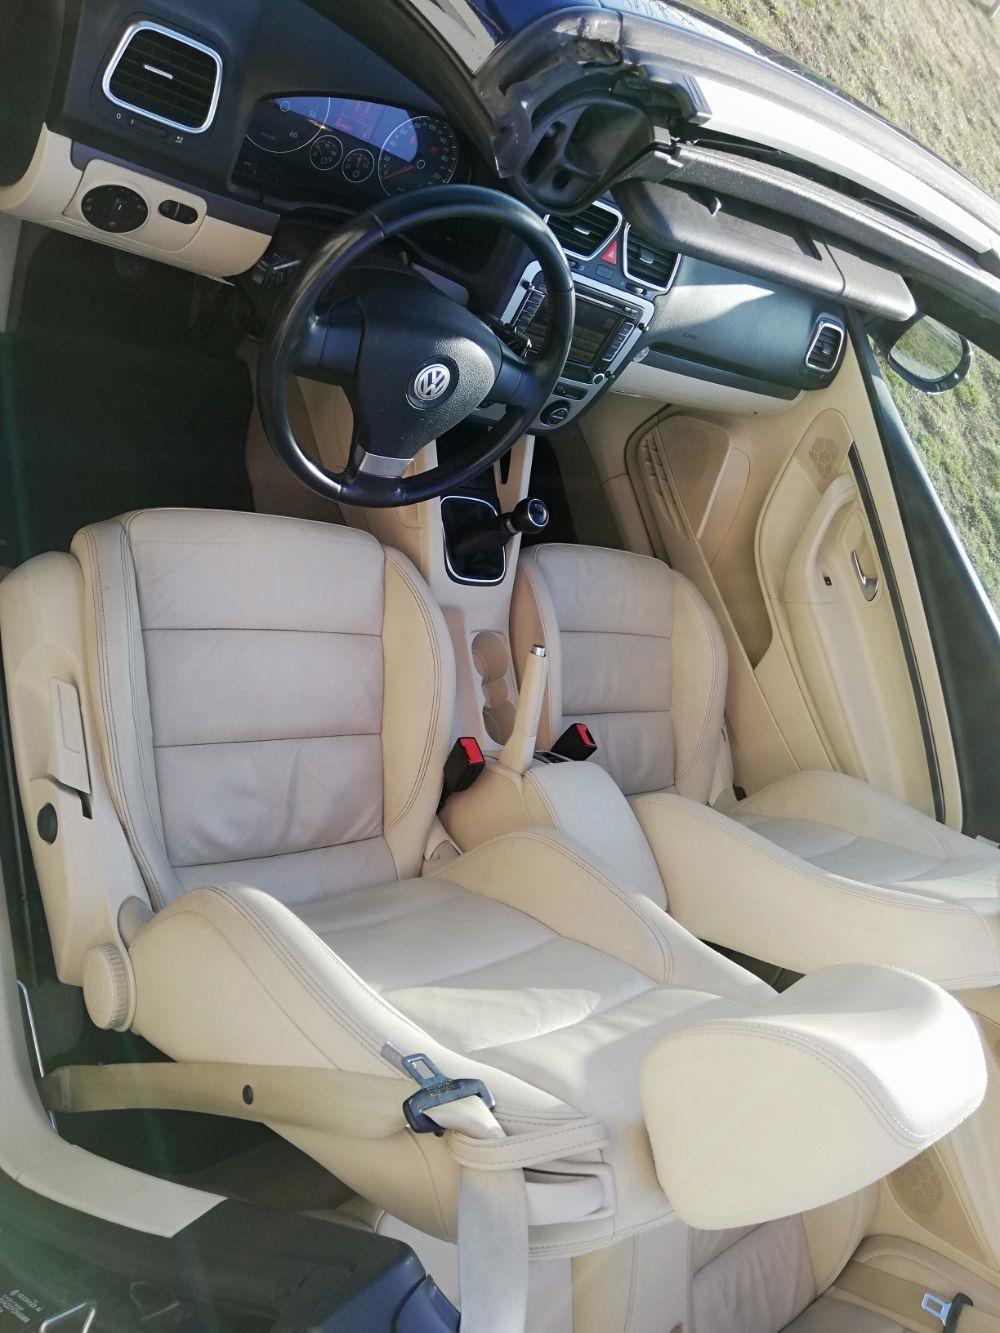 VW Eos 2.0 TDI HIGHLINE  - imagine 5